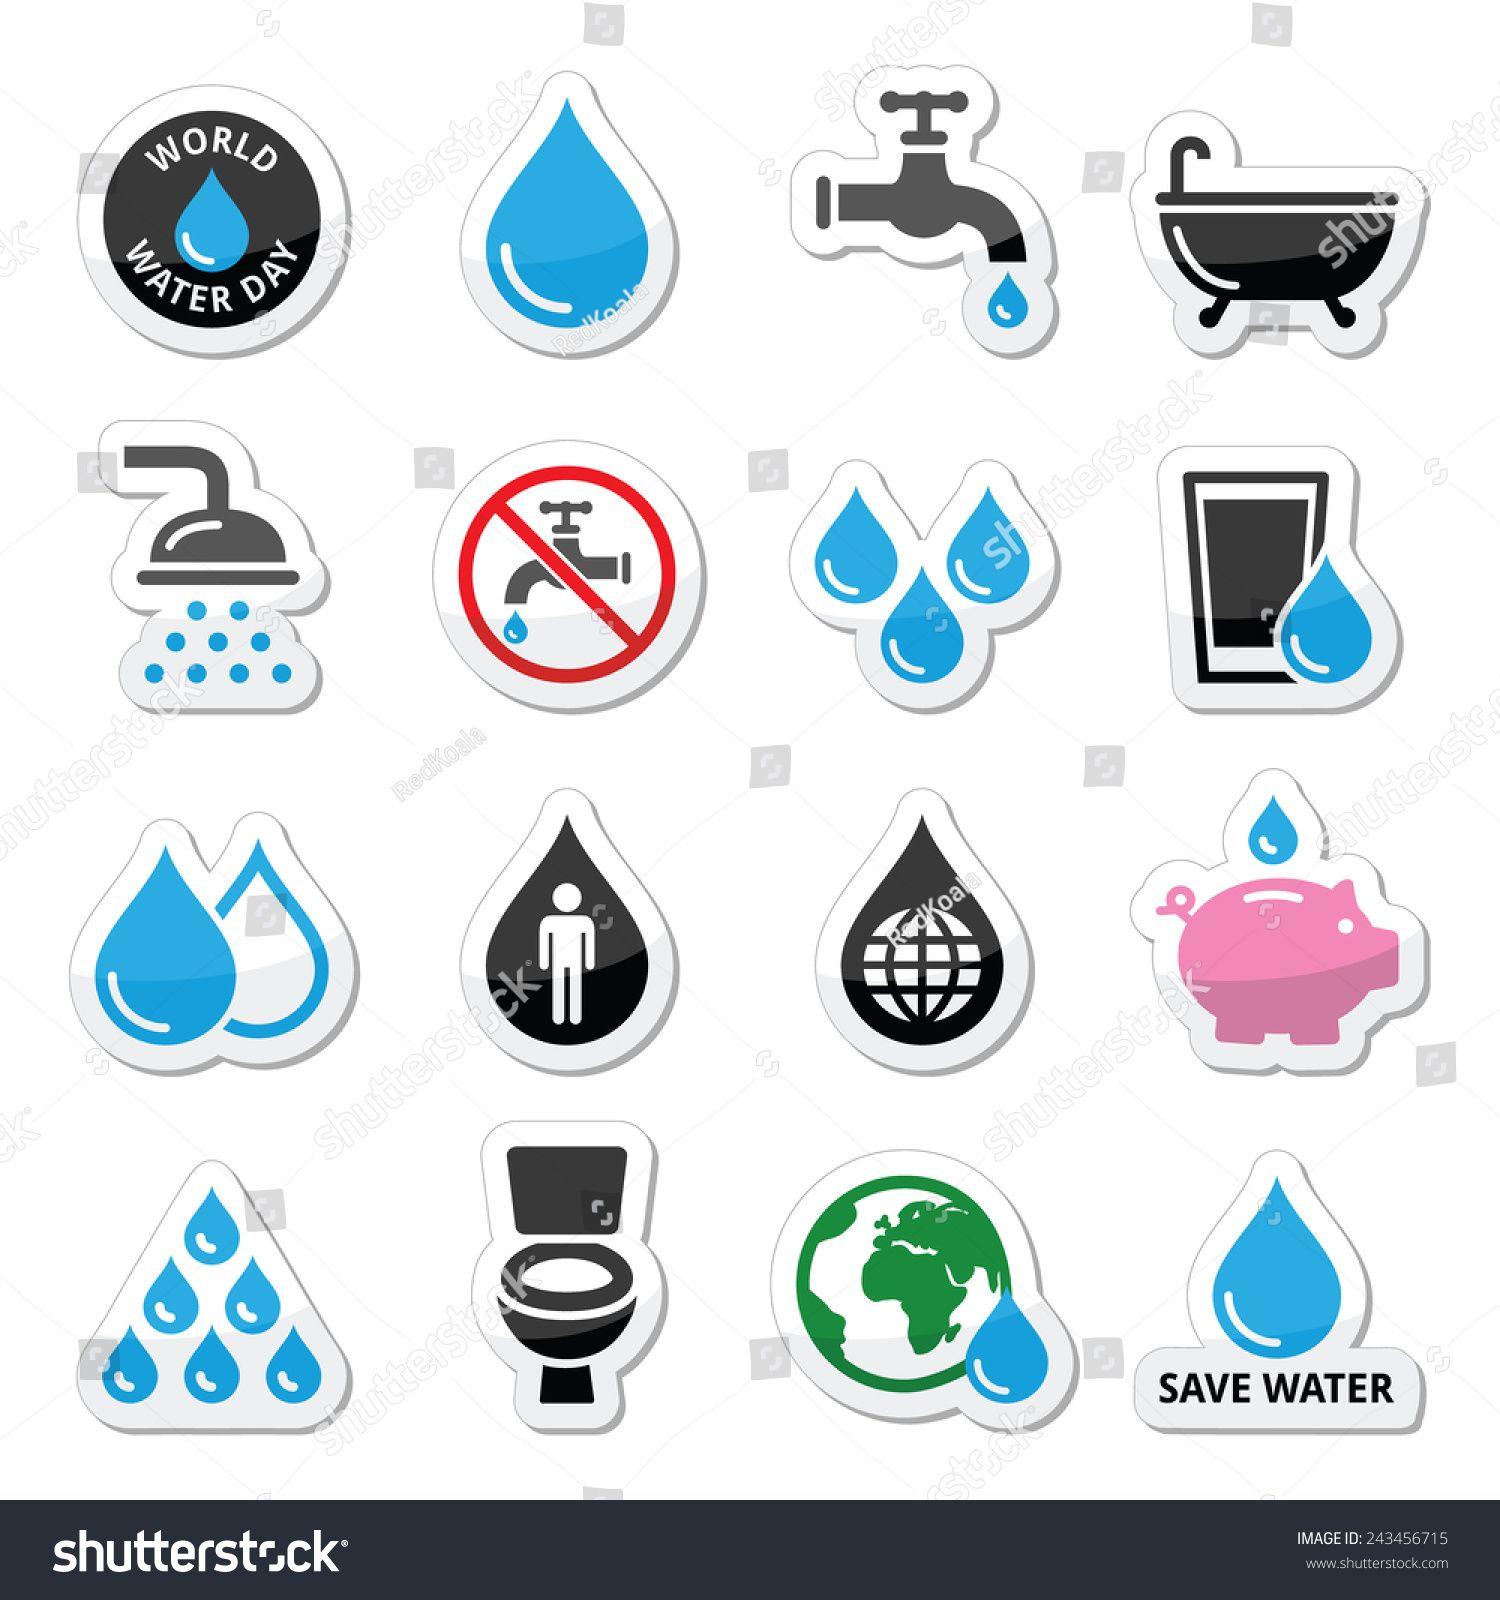 World Water Day Icons Ecology Green Concept Goruntuler Ile Resim Enerji Tasarrufu Hayaller